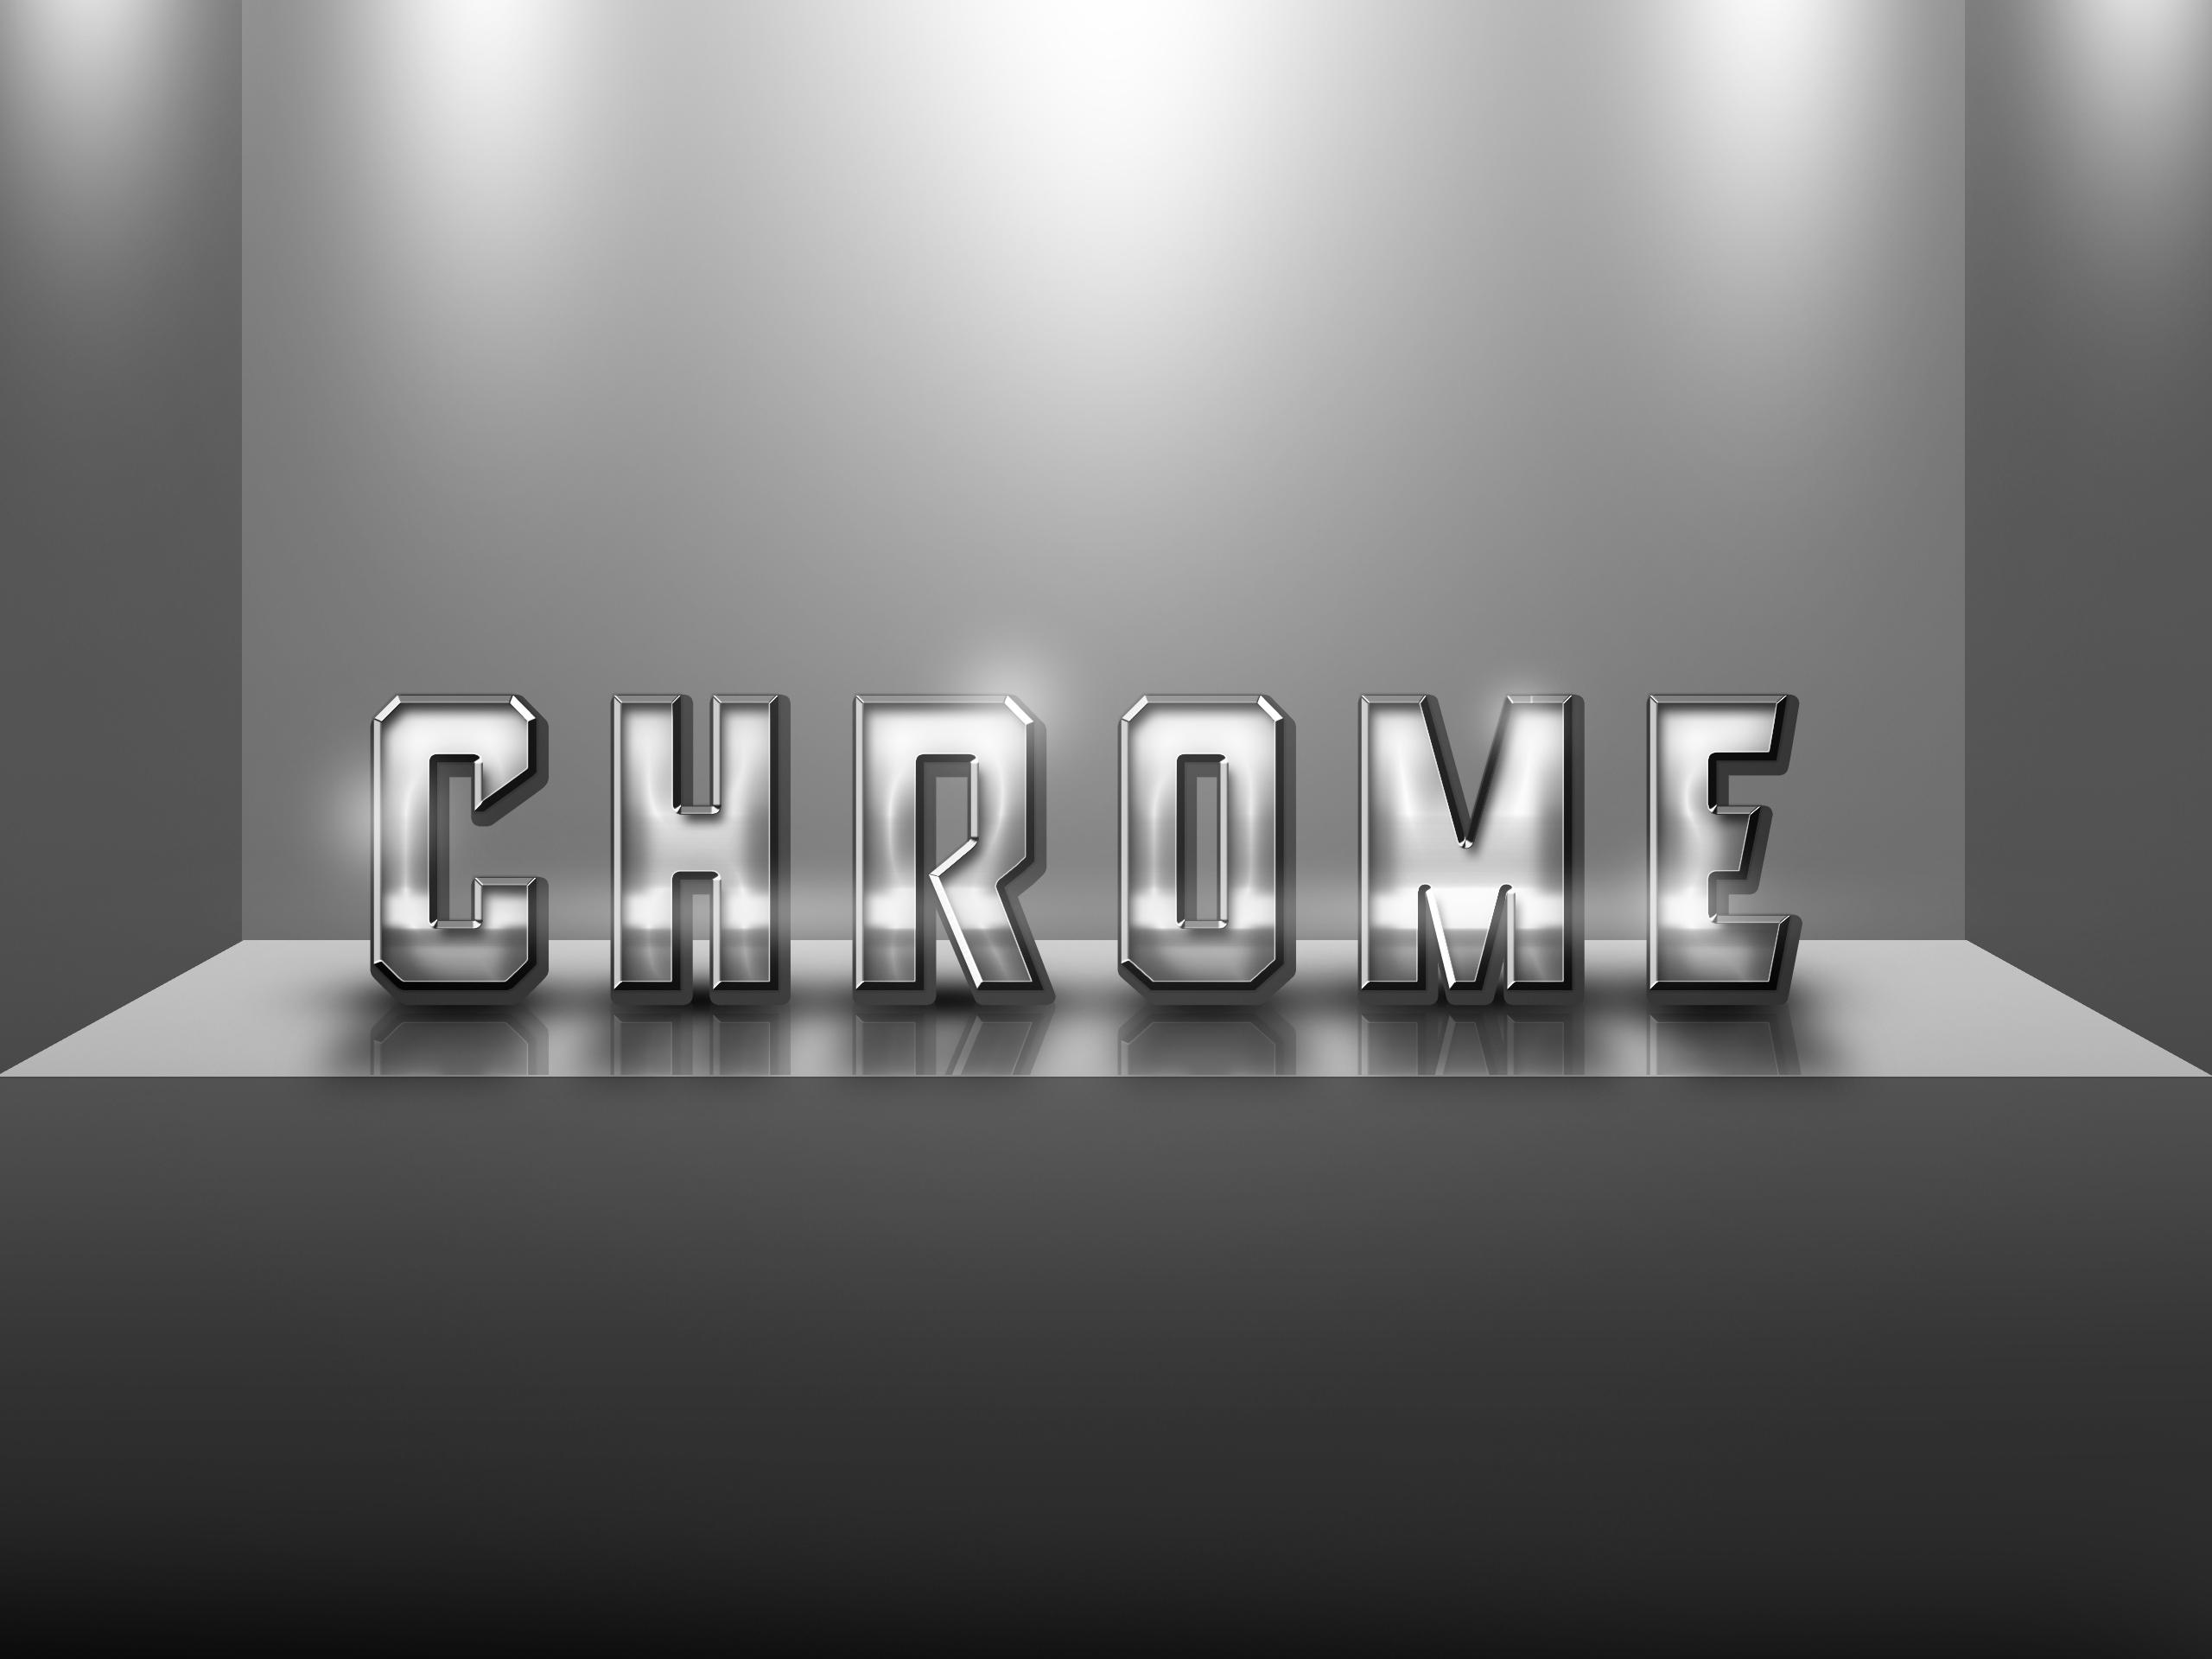 Chrome Style -FREE-